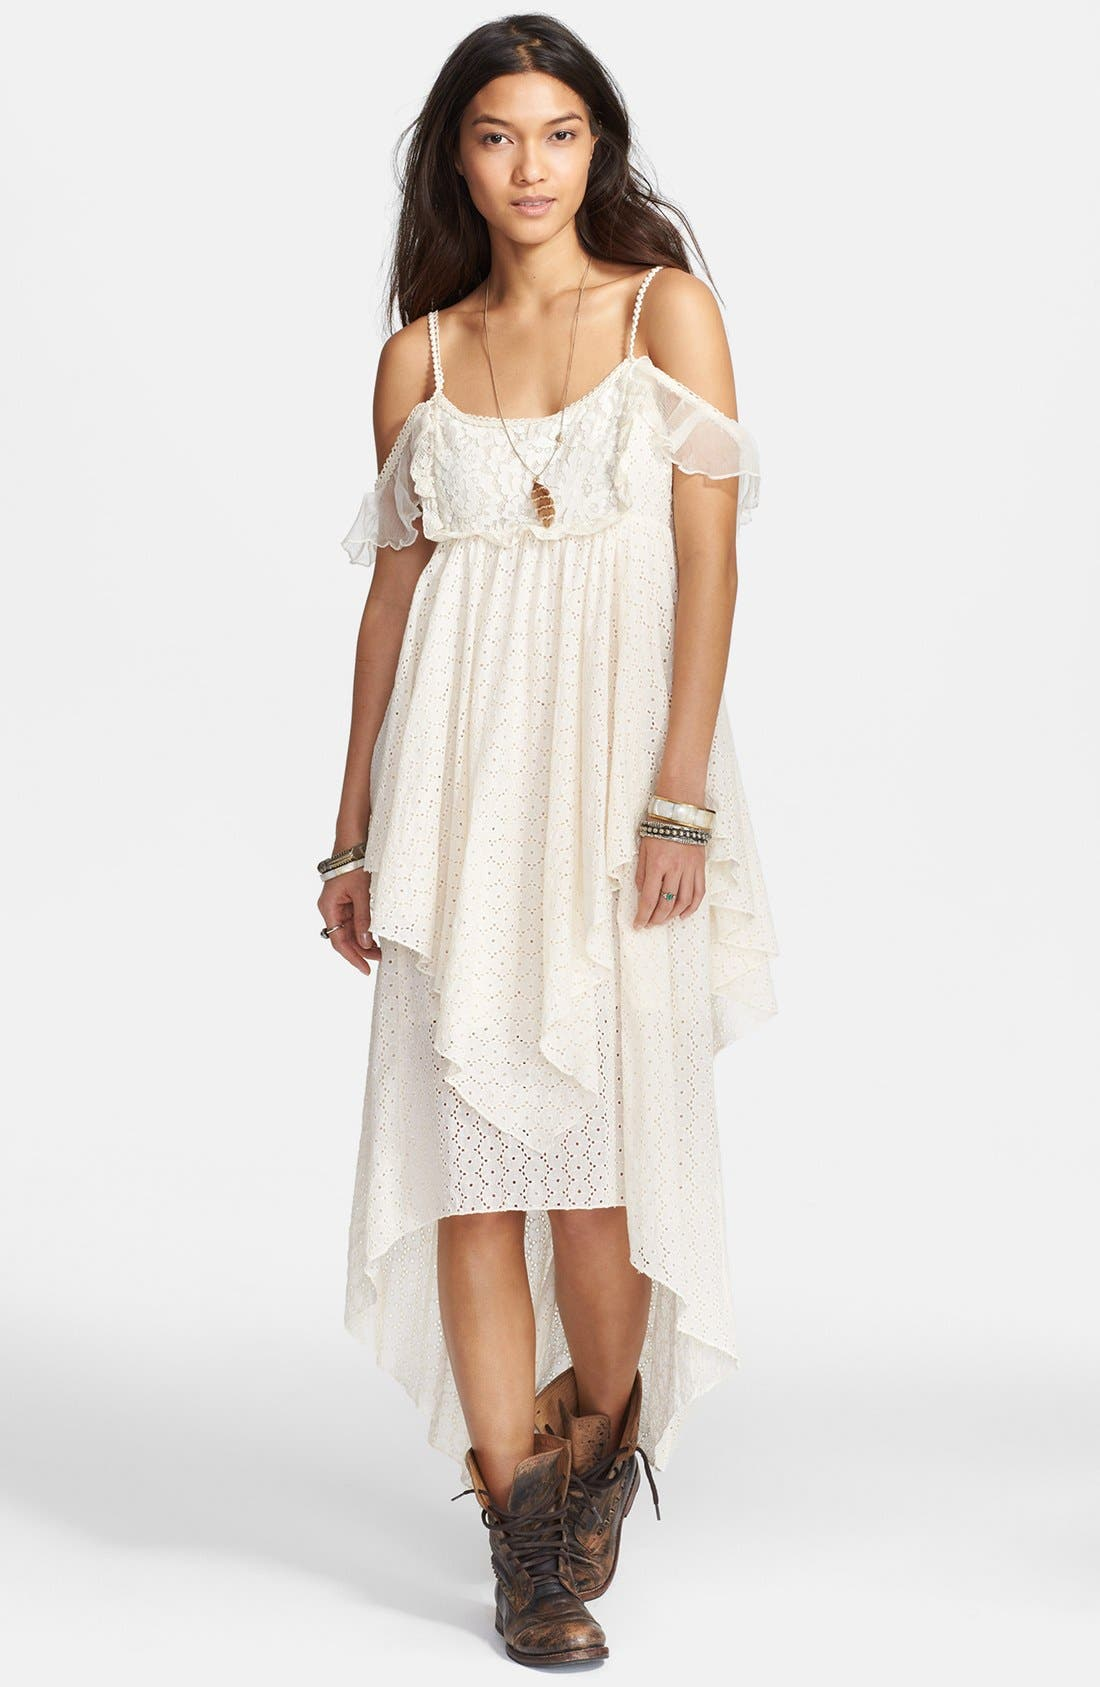 Alternate Image 1 Selected - Free People 'Candle Light' Eyelet Midi Dress